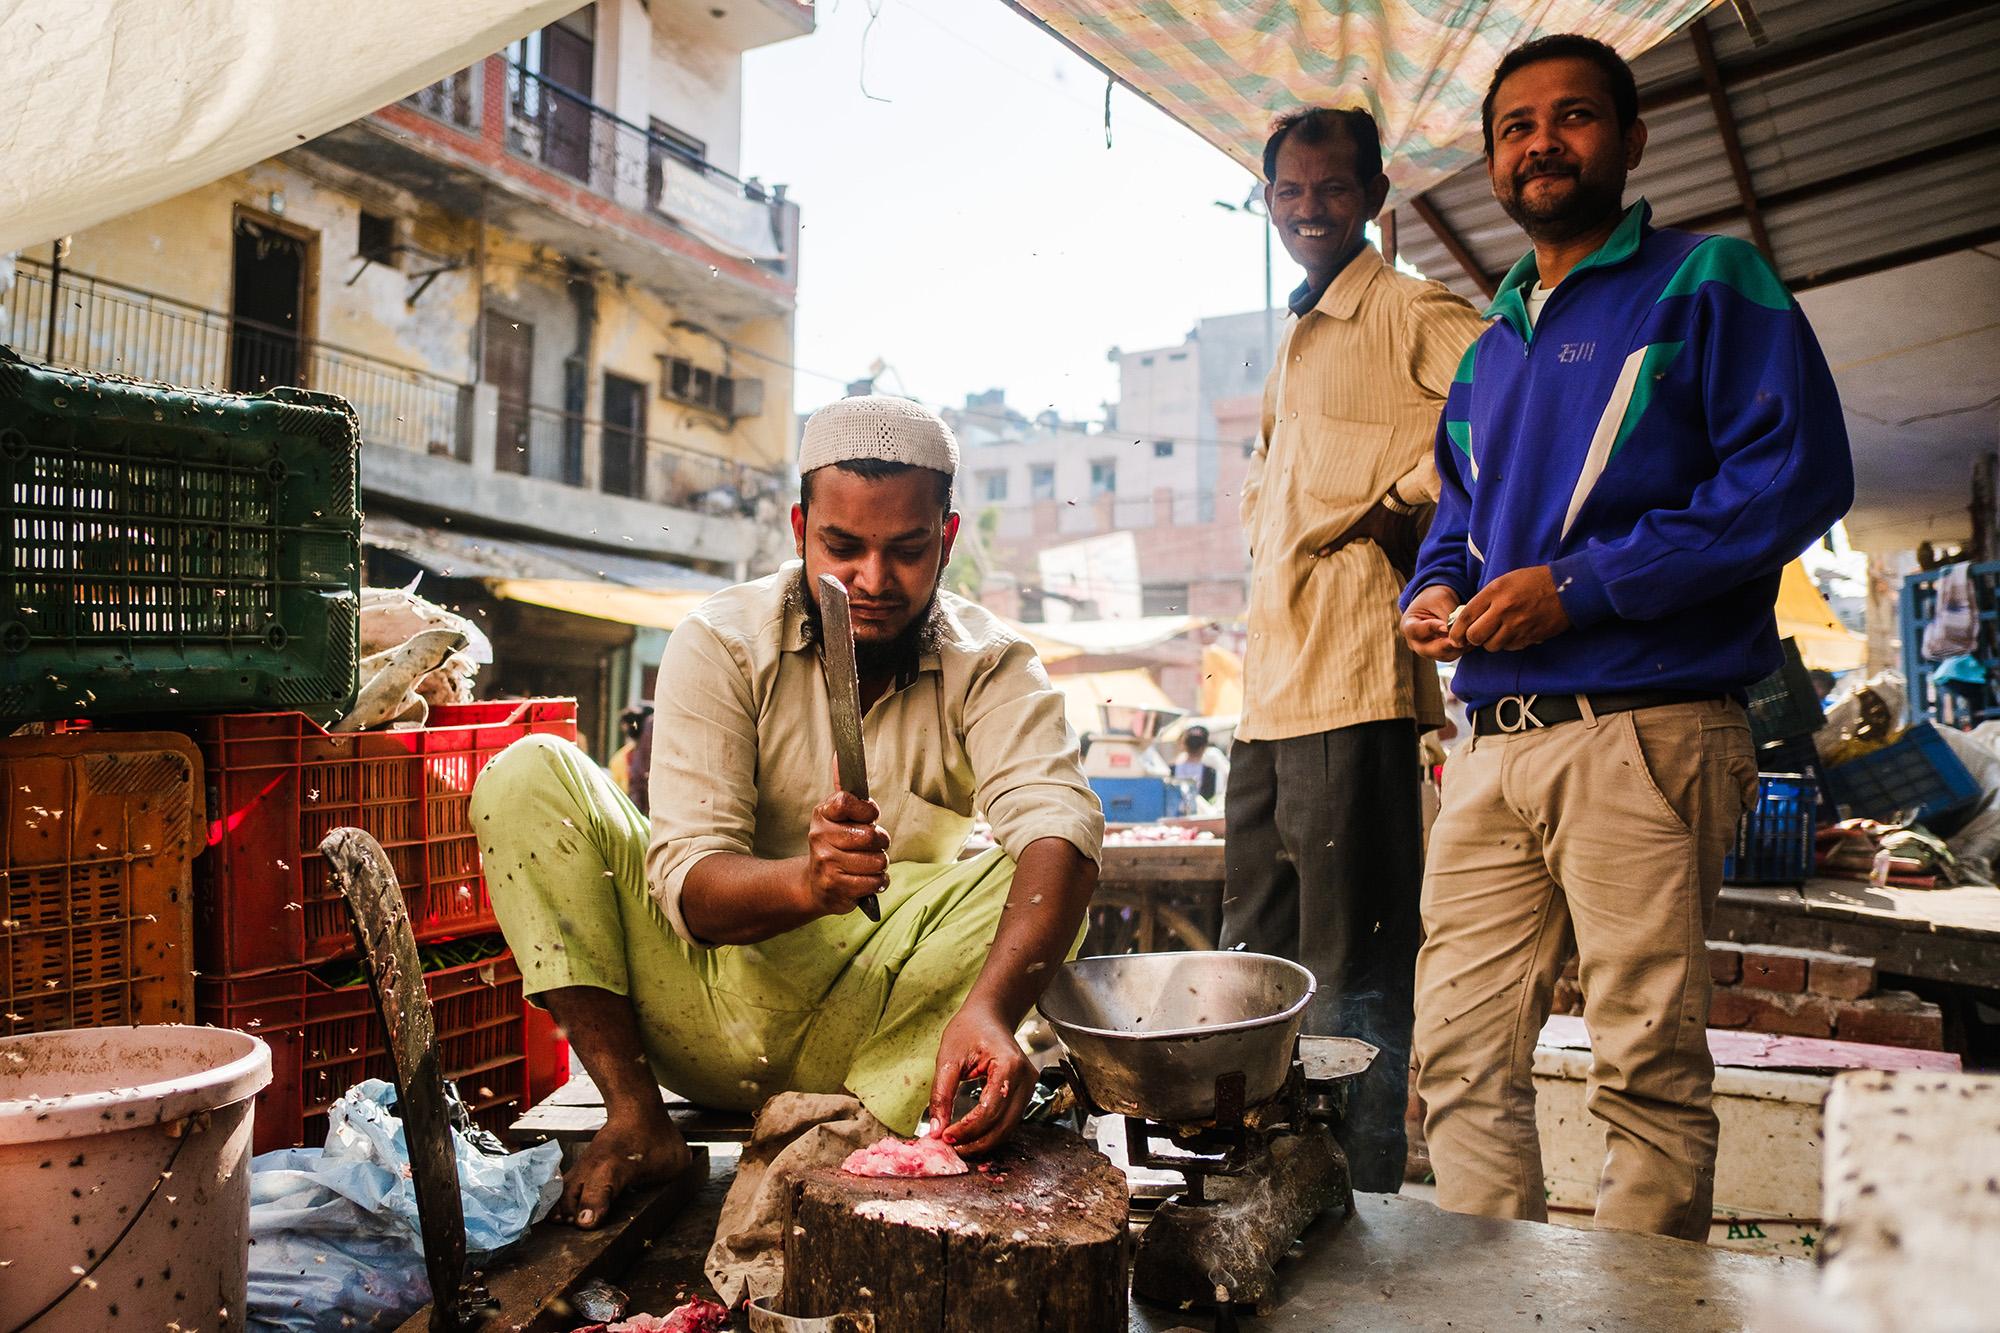 AnjaPoehlmann_India-Delhi_032.jpg